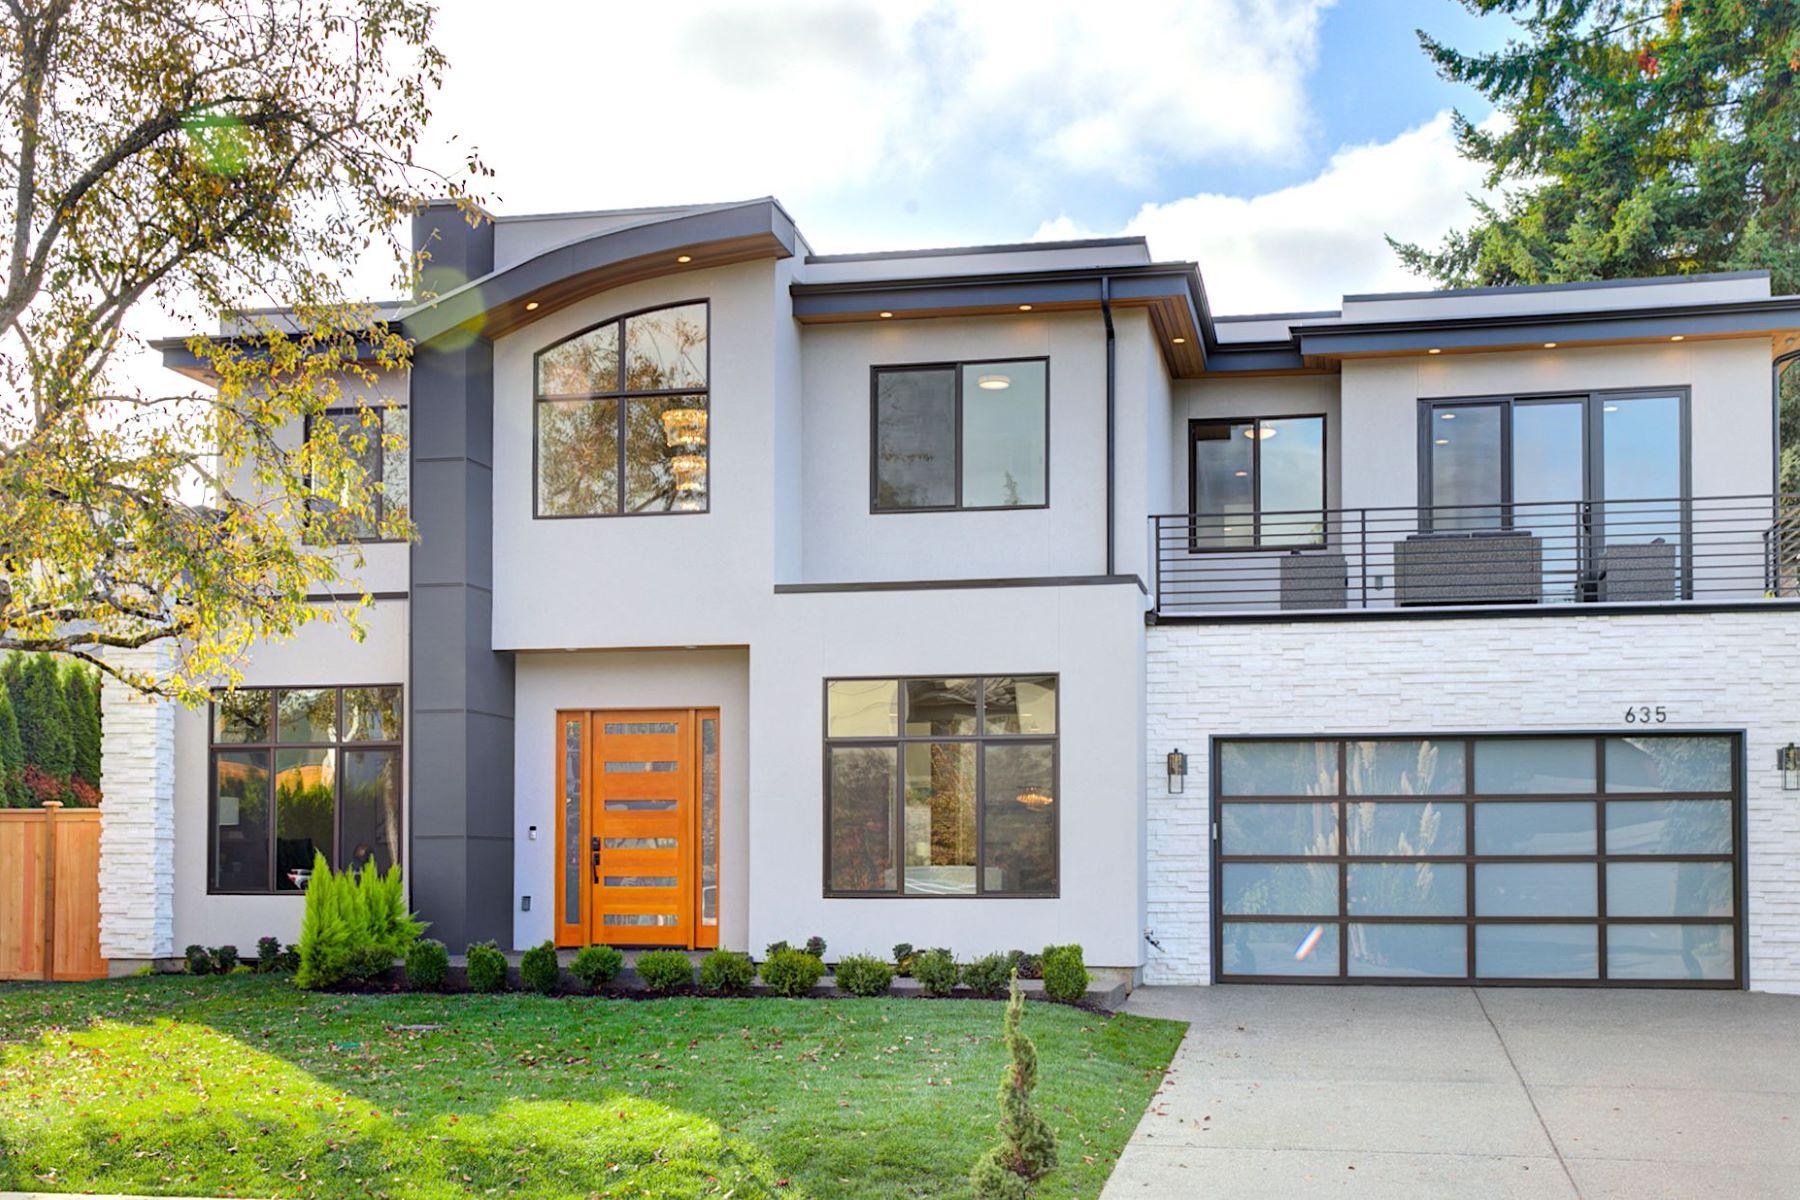 Single Family Homes for Sale at 635 10th Ave, Kirkland, WA 98033 635 10th Ave Kirkland, Washington 98033 United States